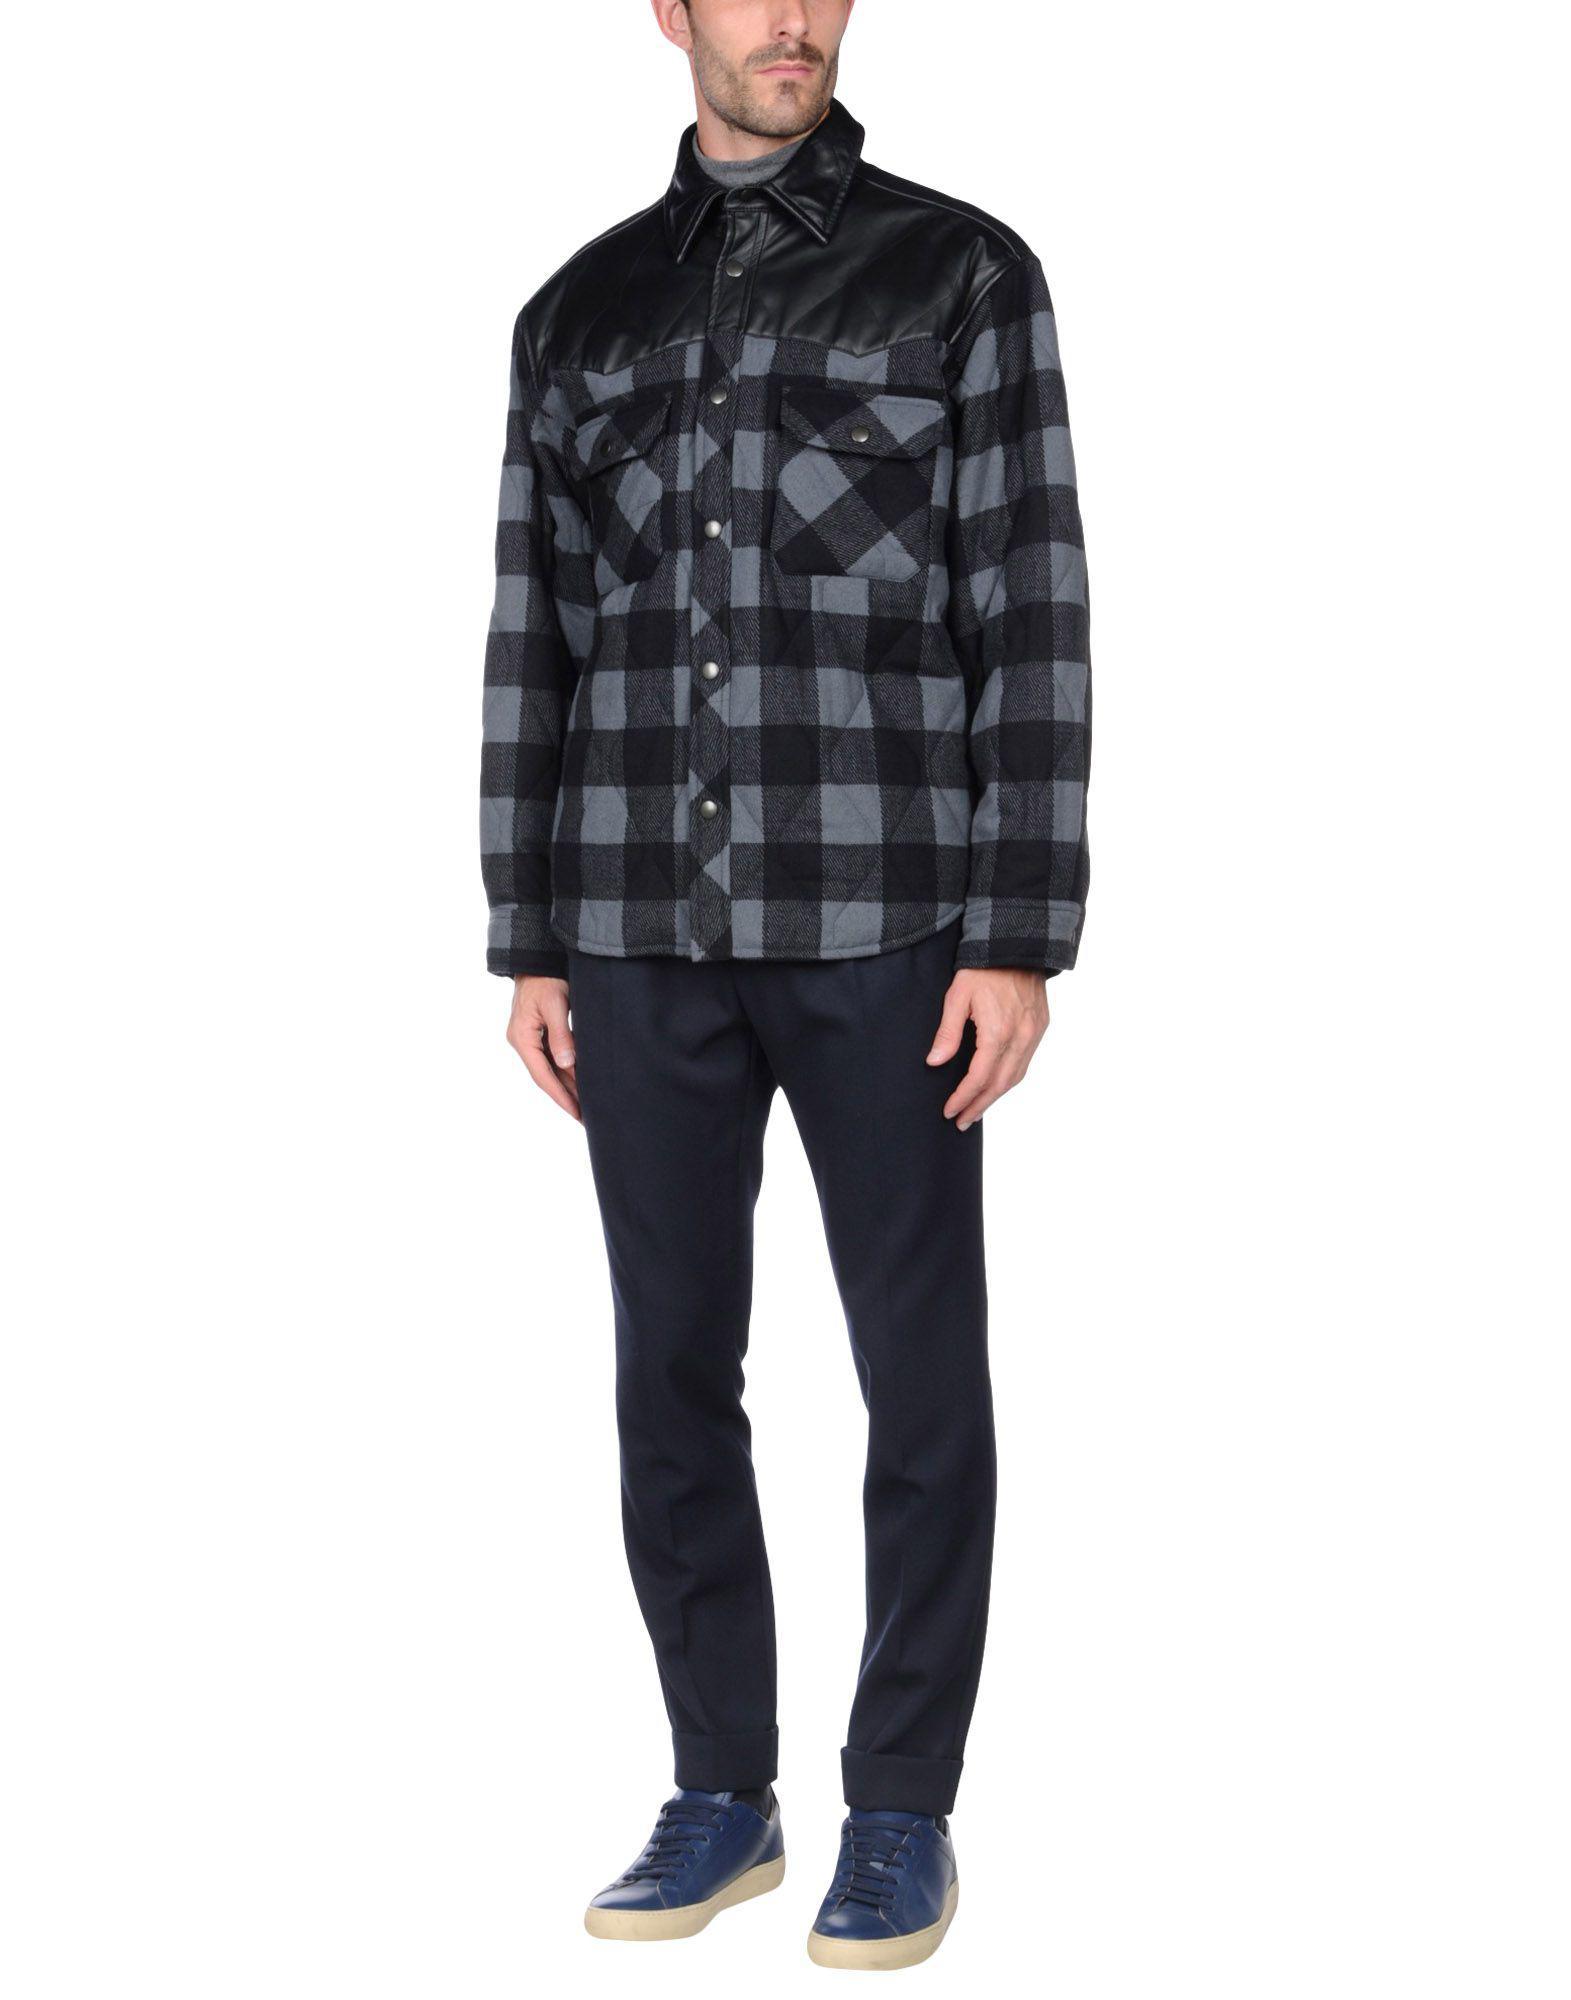 Lyst Balenciaga Jackets In Black For Men